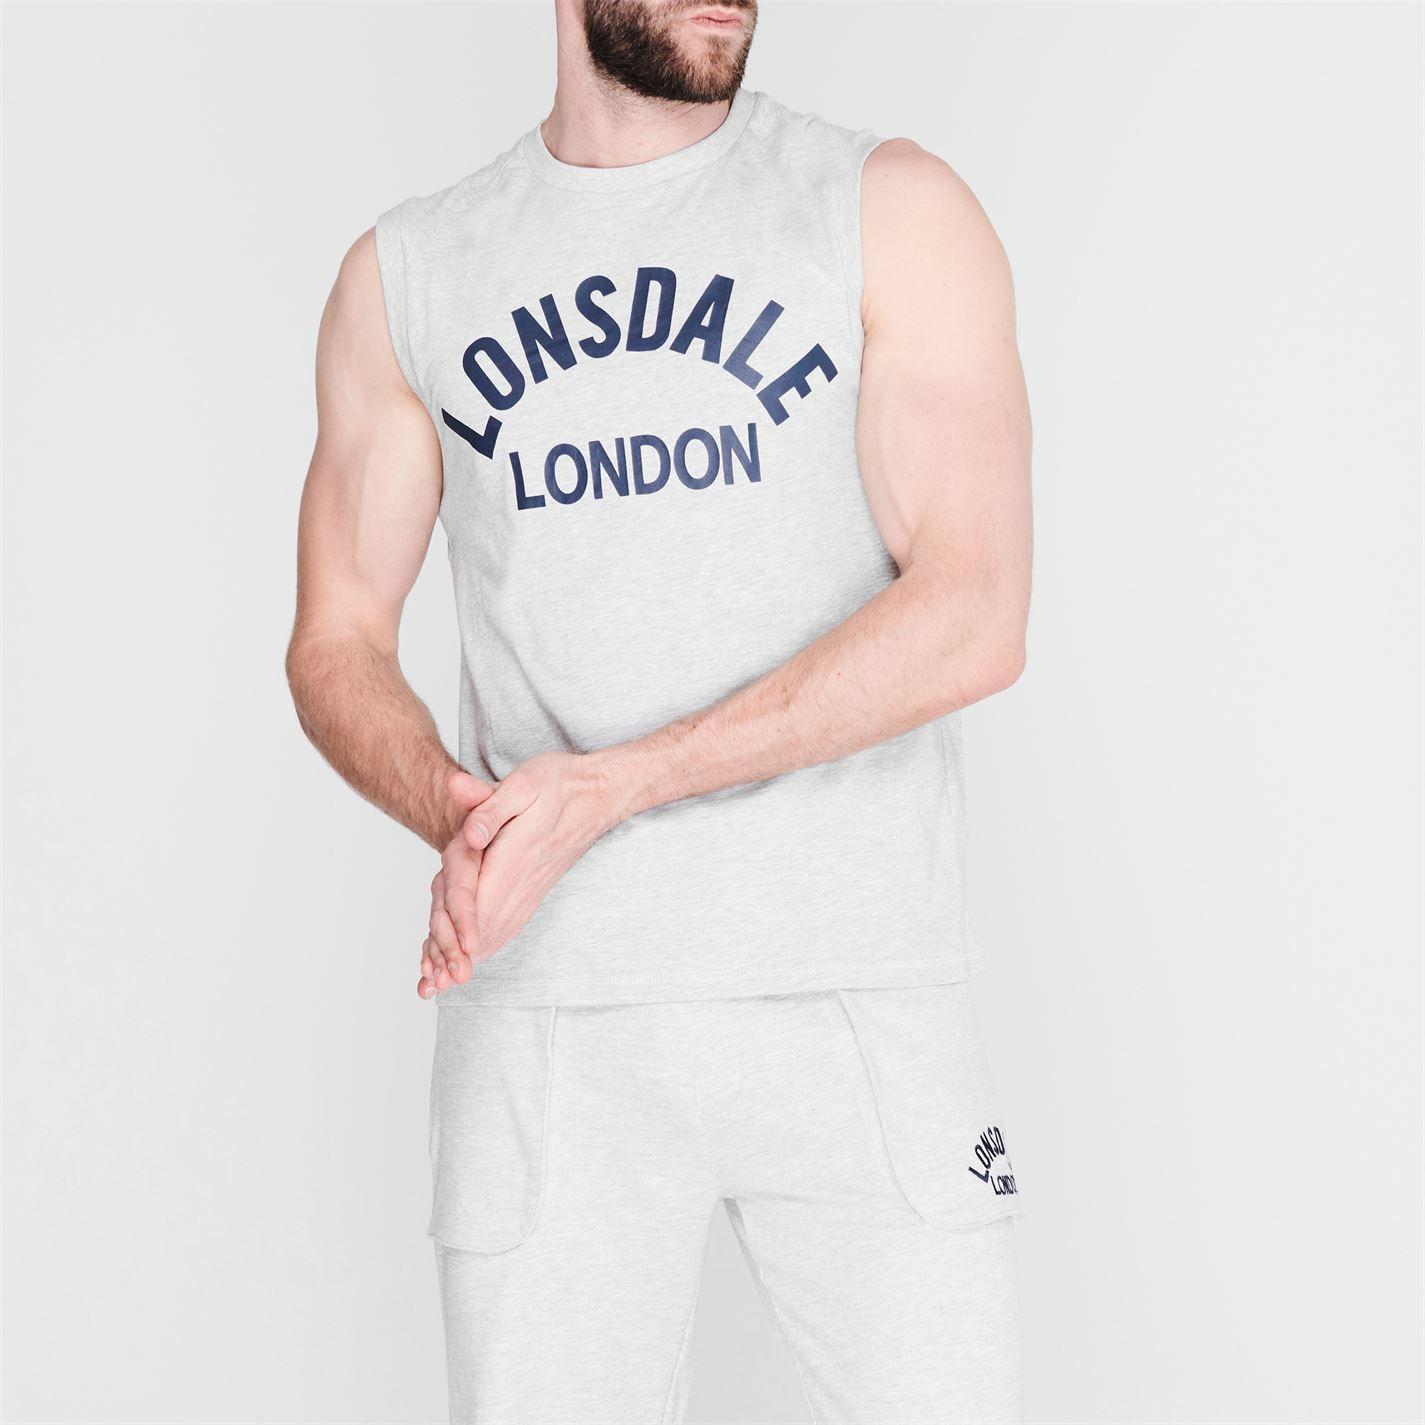 Lonsdale Mens Box Tank Vest Crew Neck Cotton Boxing Sleeveless MMA Sports Top